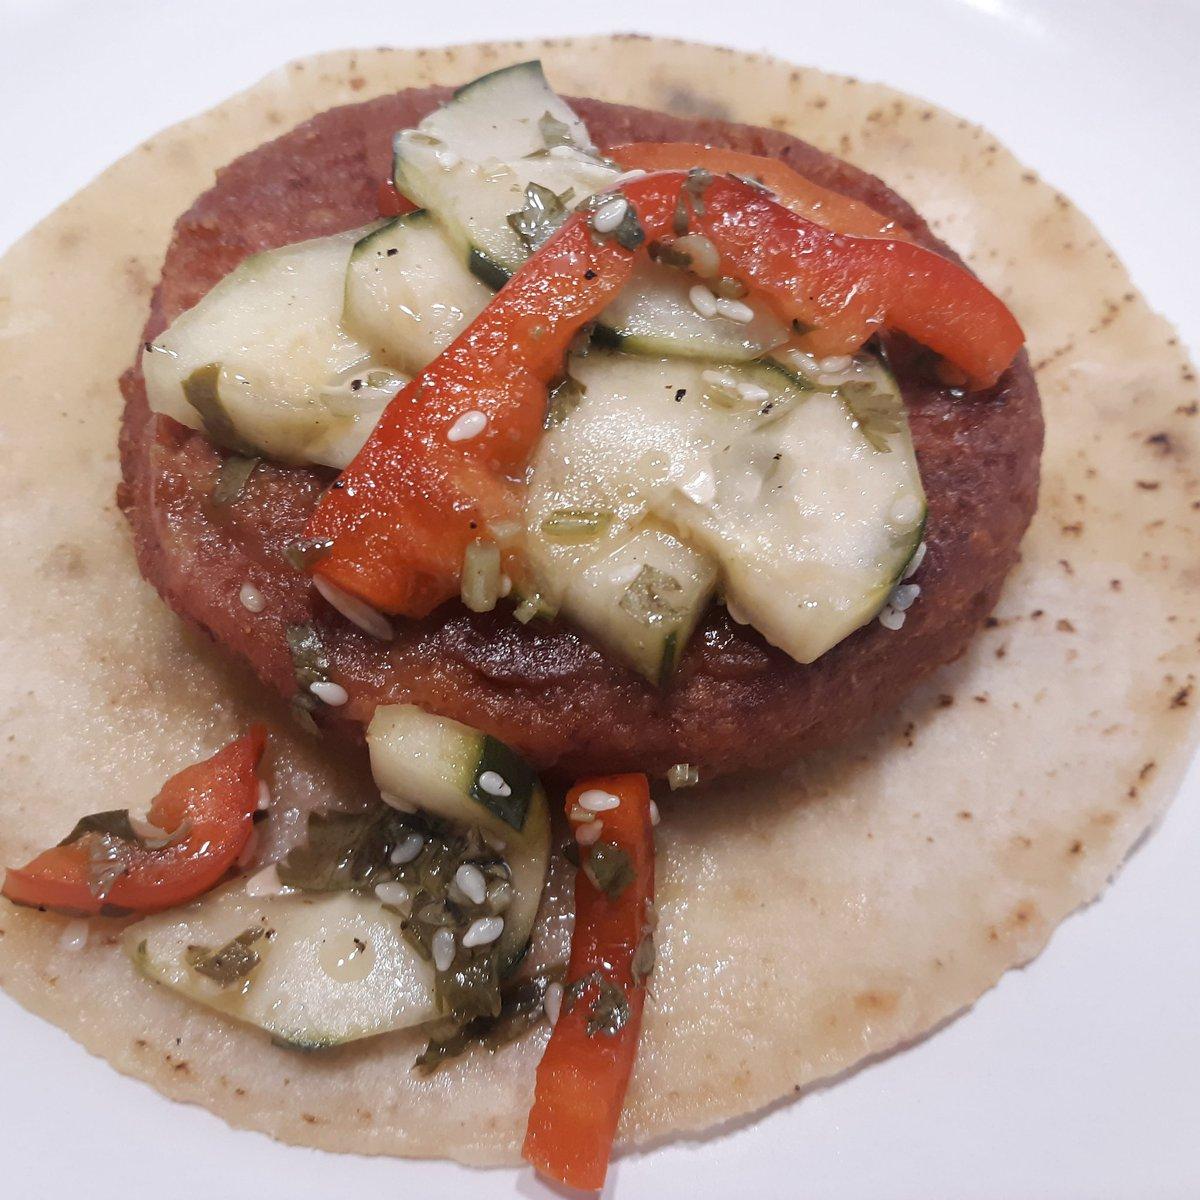 For lunch I had @RainbowAcresCa cucumber salad and #TraderJoes protein pattie #veganfood #veganlunchpic.twitter.com/m7cgkc4tkX